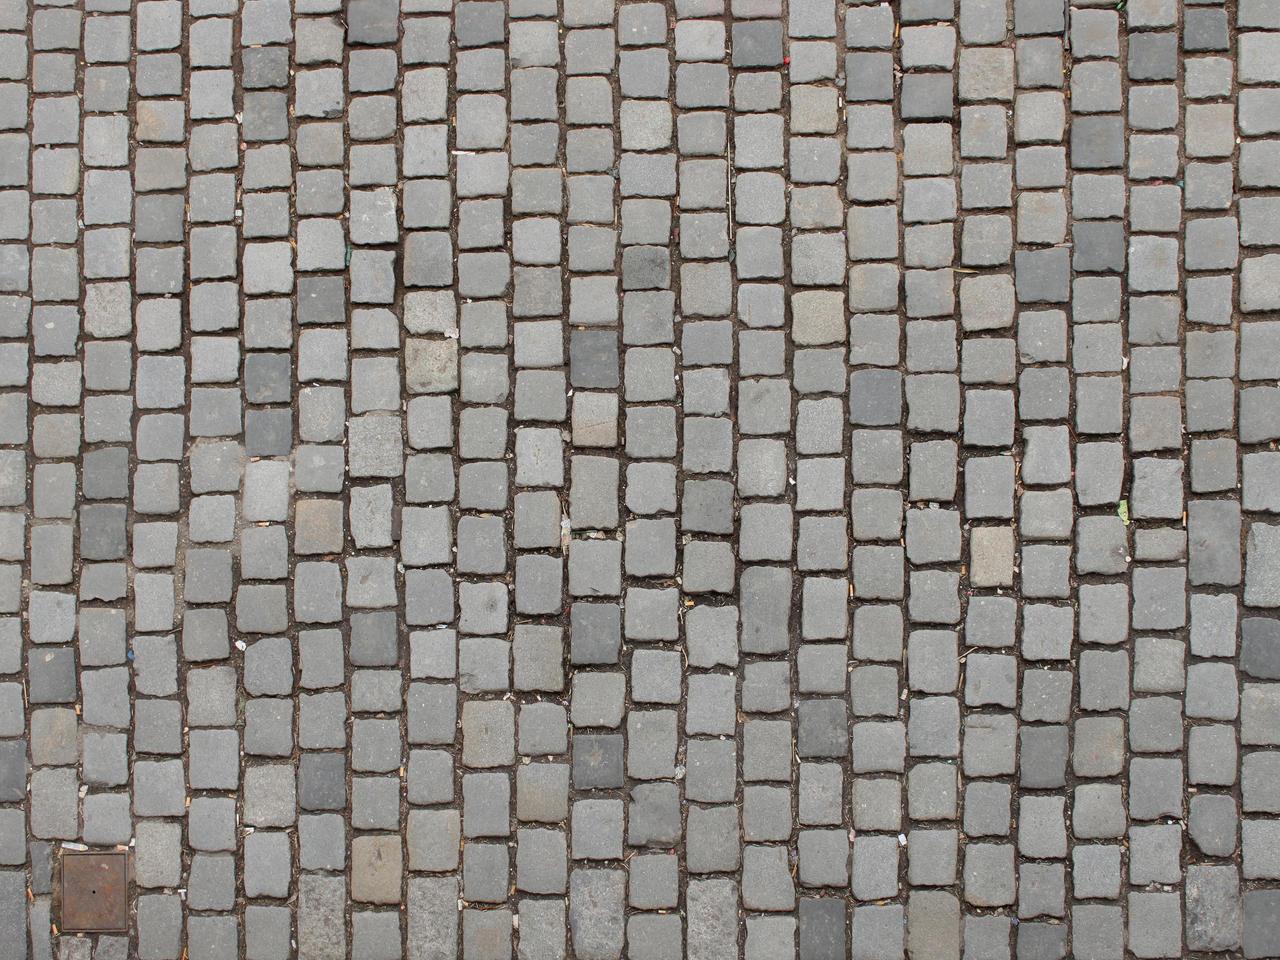 Floor Texture - 8 by AGF81 on DeviantArt